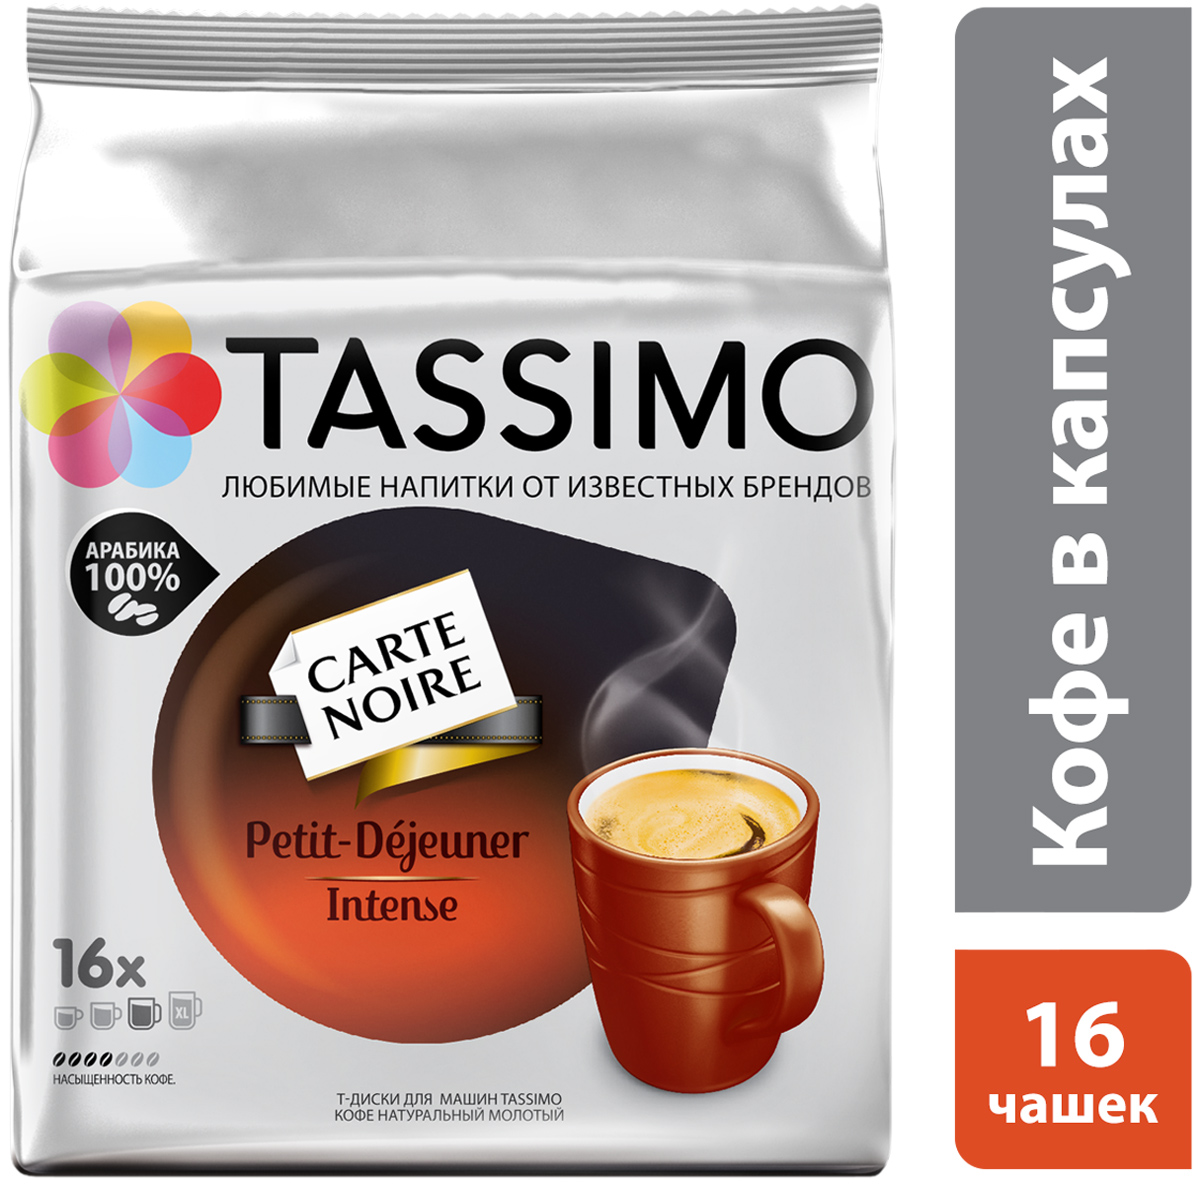 Tassimo Carte Noire Petit-Dejeuner Intense кофе в капсулах, 16 шт капсулы т диски tassimo jacobs americano 16 порций